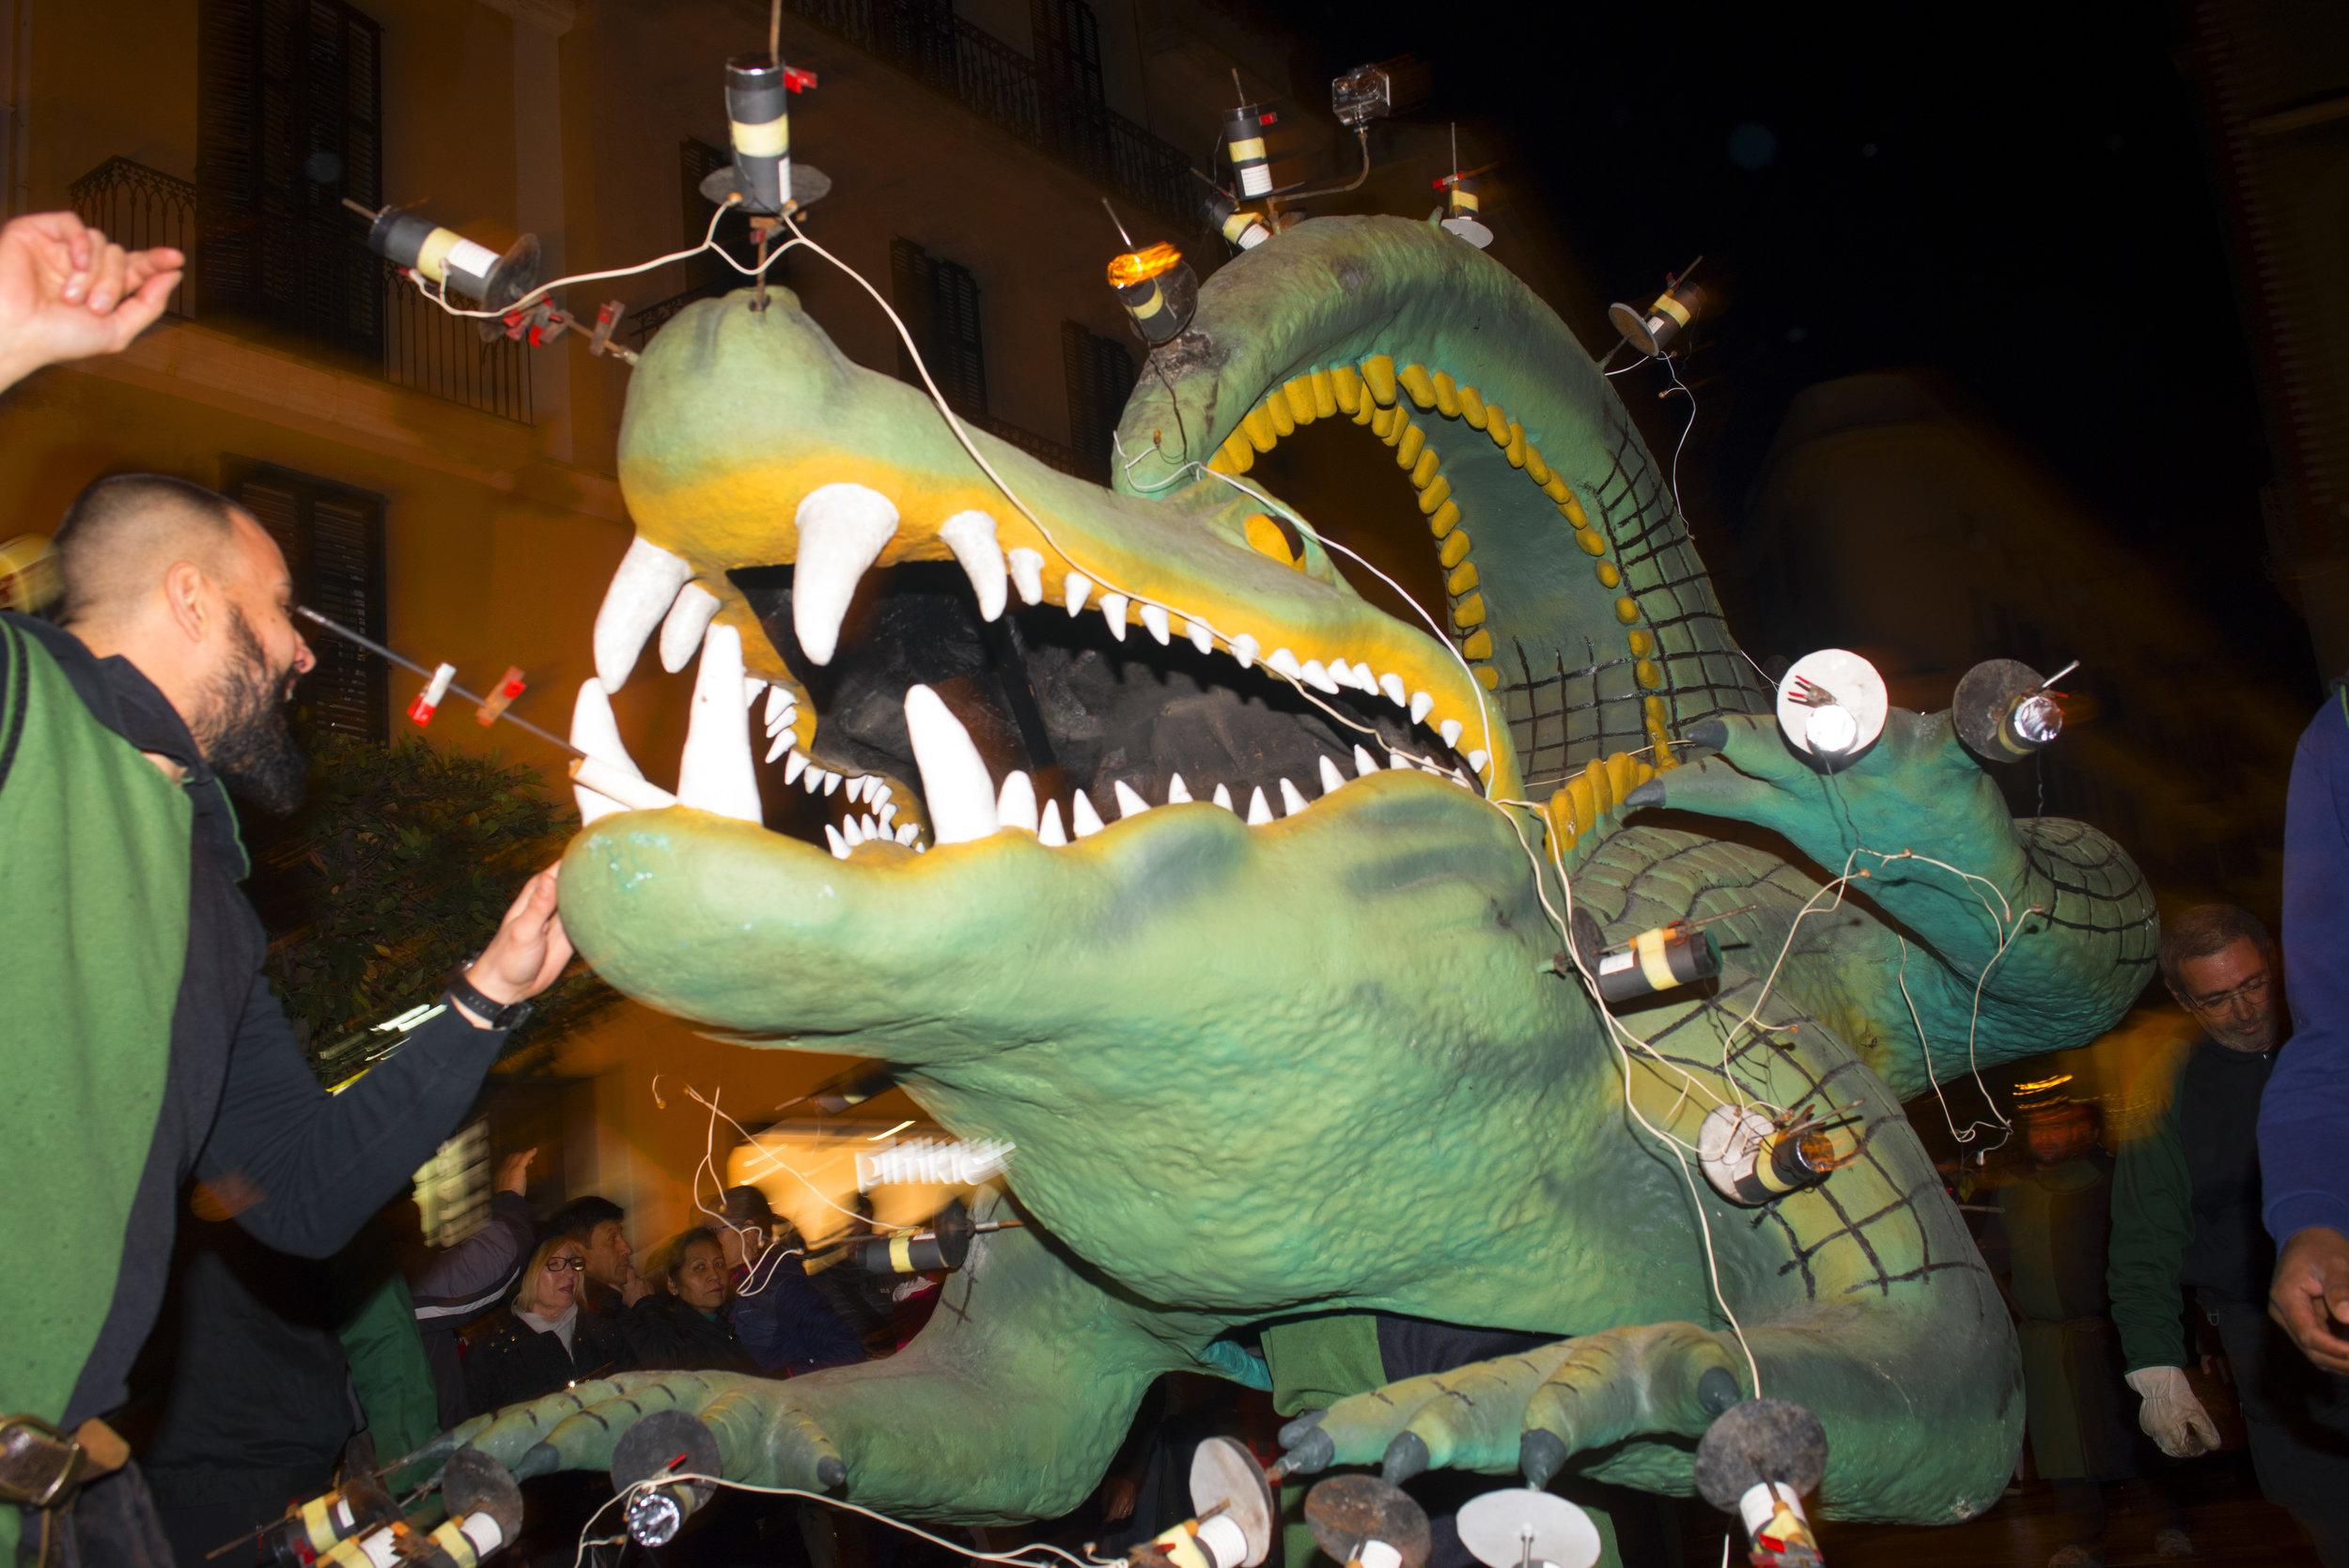 Lighting the dragon at Sant Sebastian Festival at Palma, Mallorca Spain.